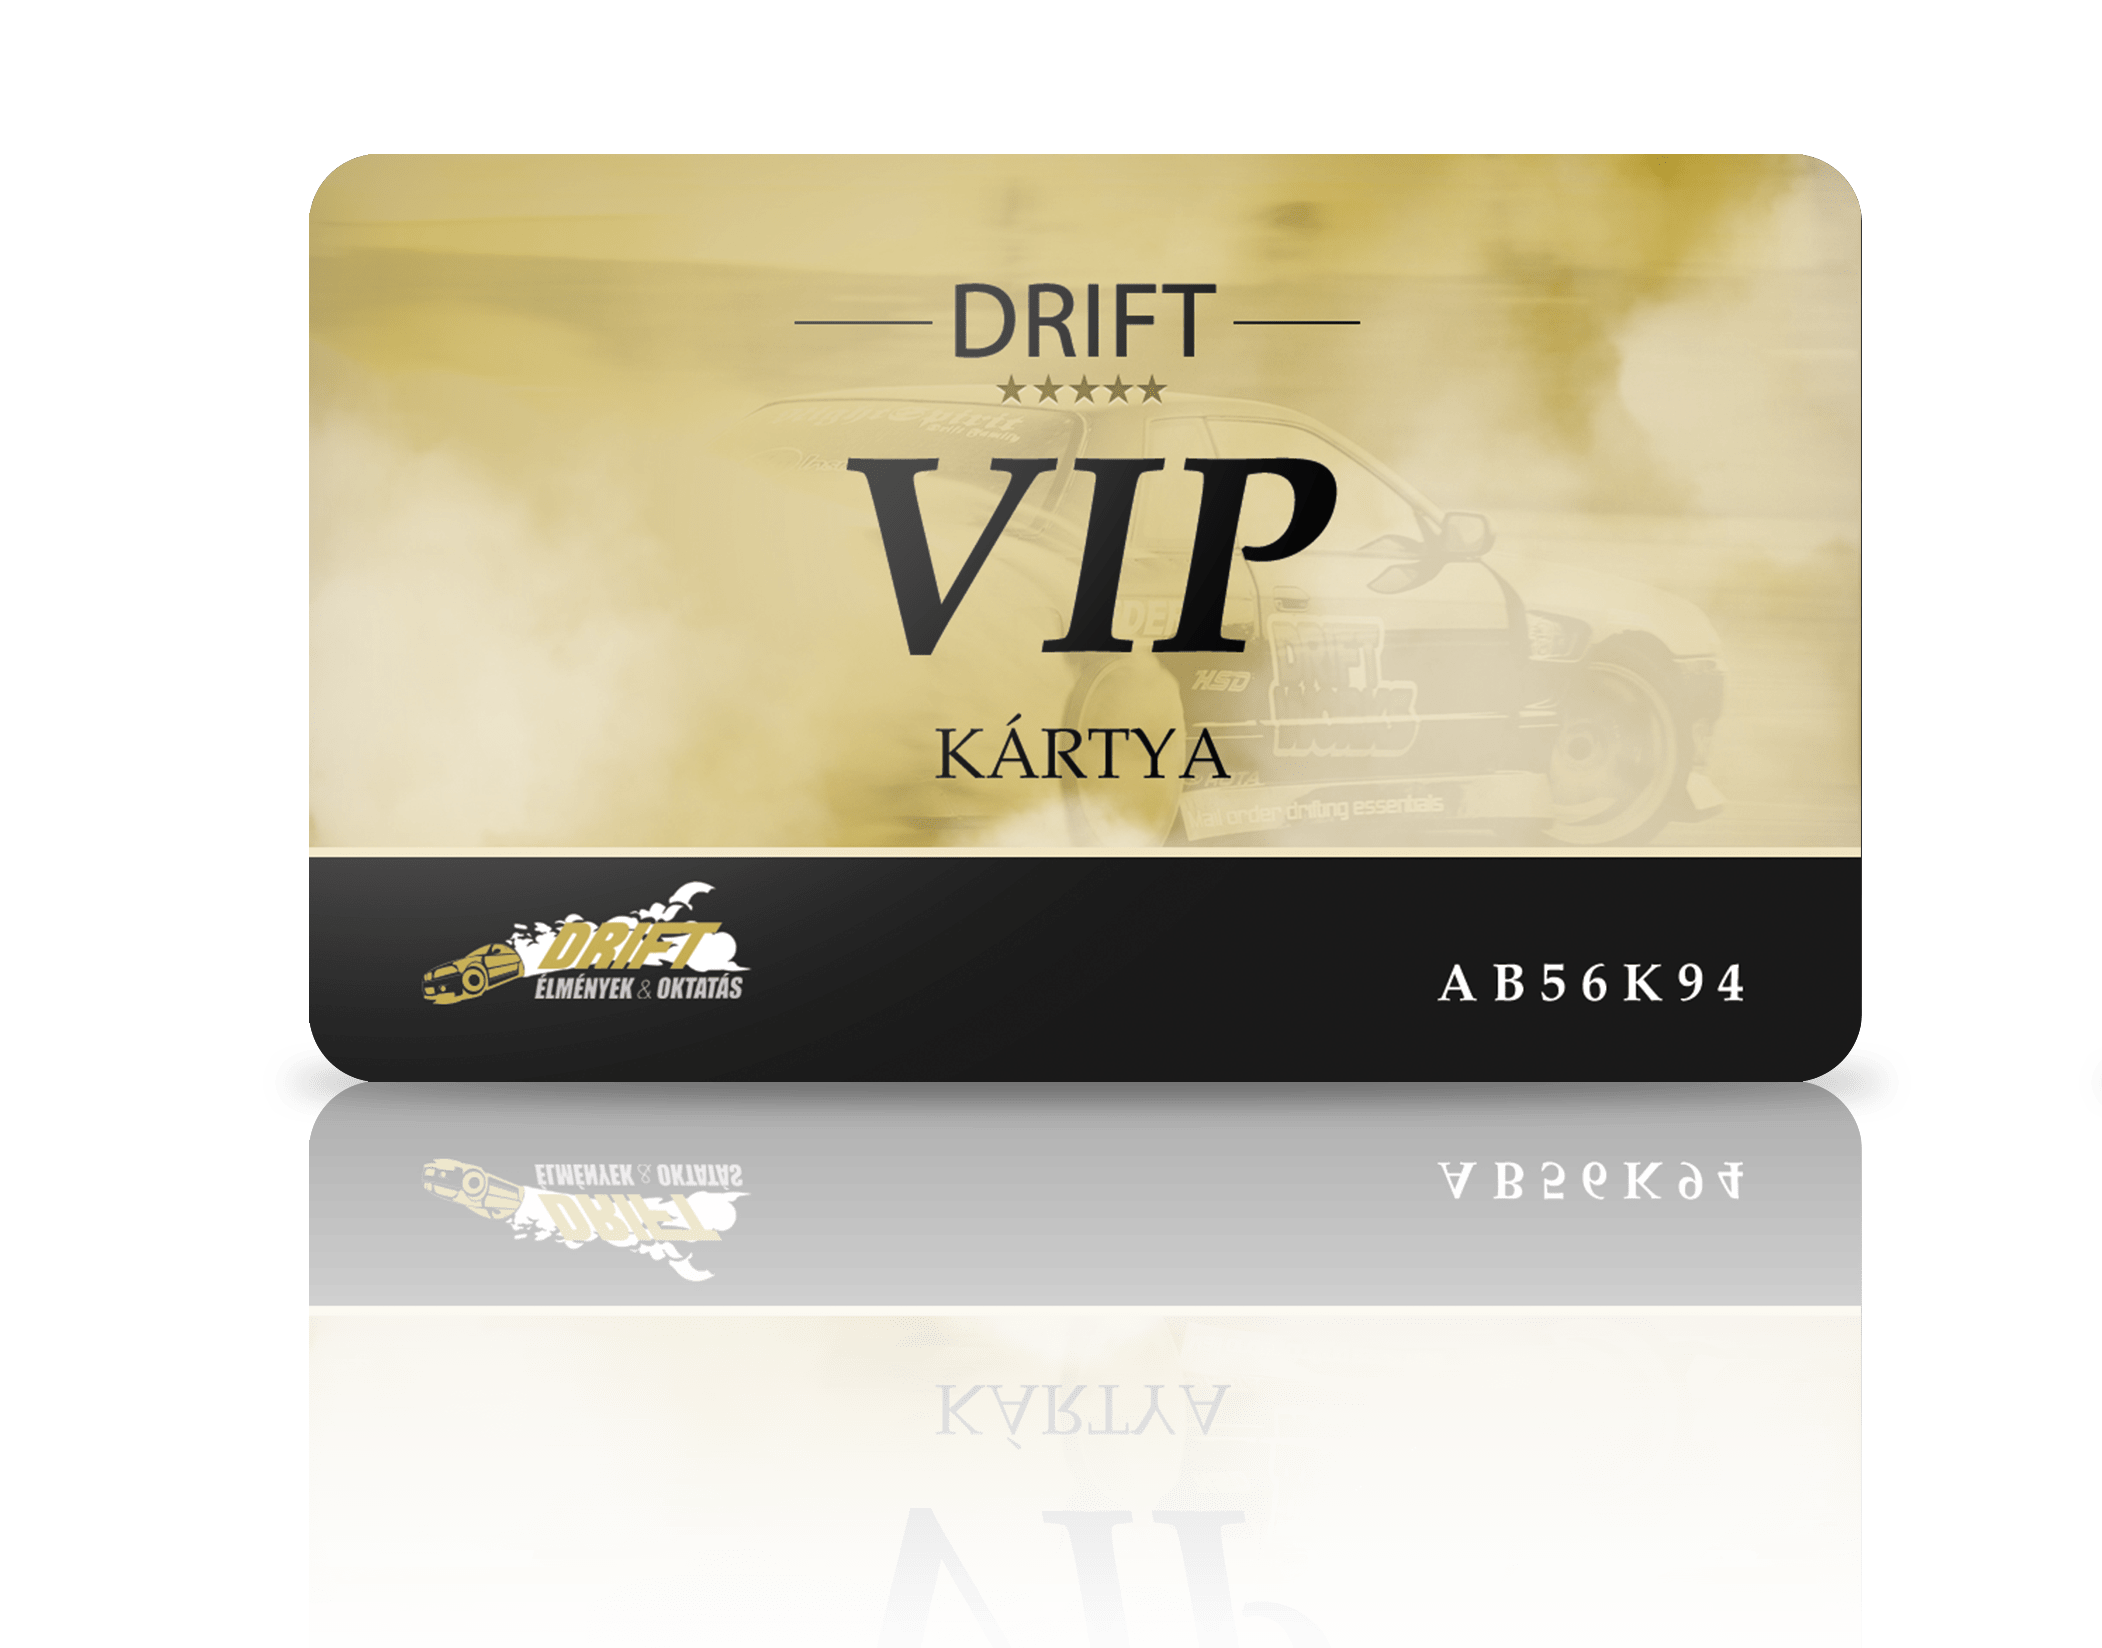 Drift VIP kártya